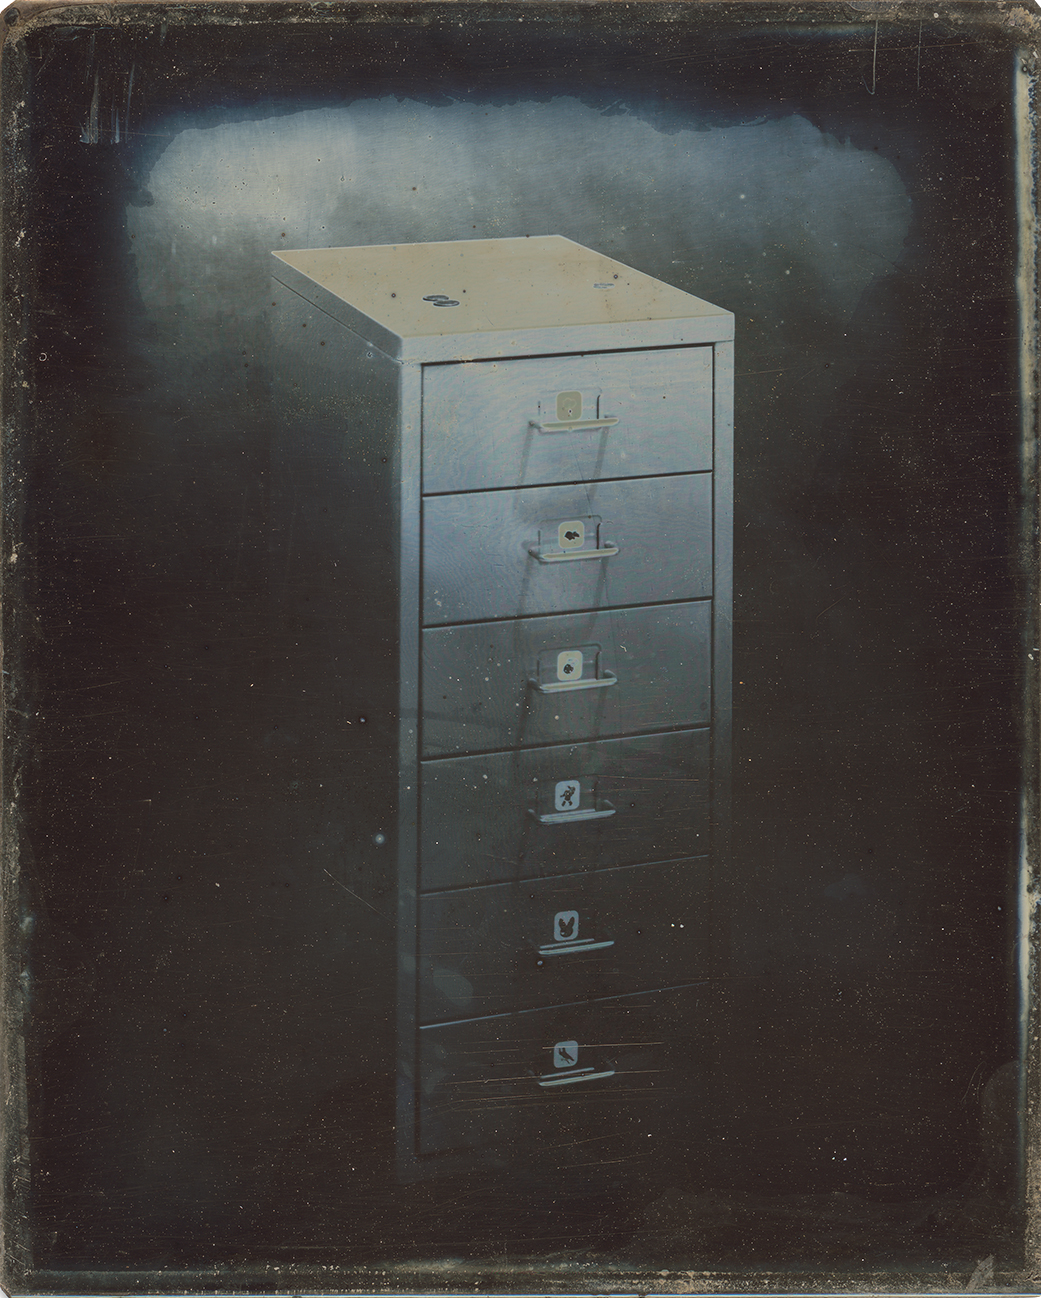 Ikea_Drawer,_copper,_Silver,_Gold_(Daguerreotype),_11X9_cm,_2012.jpg